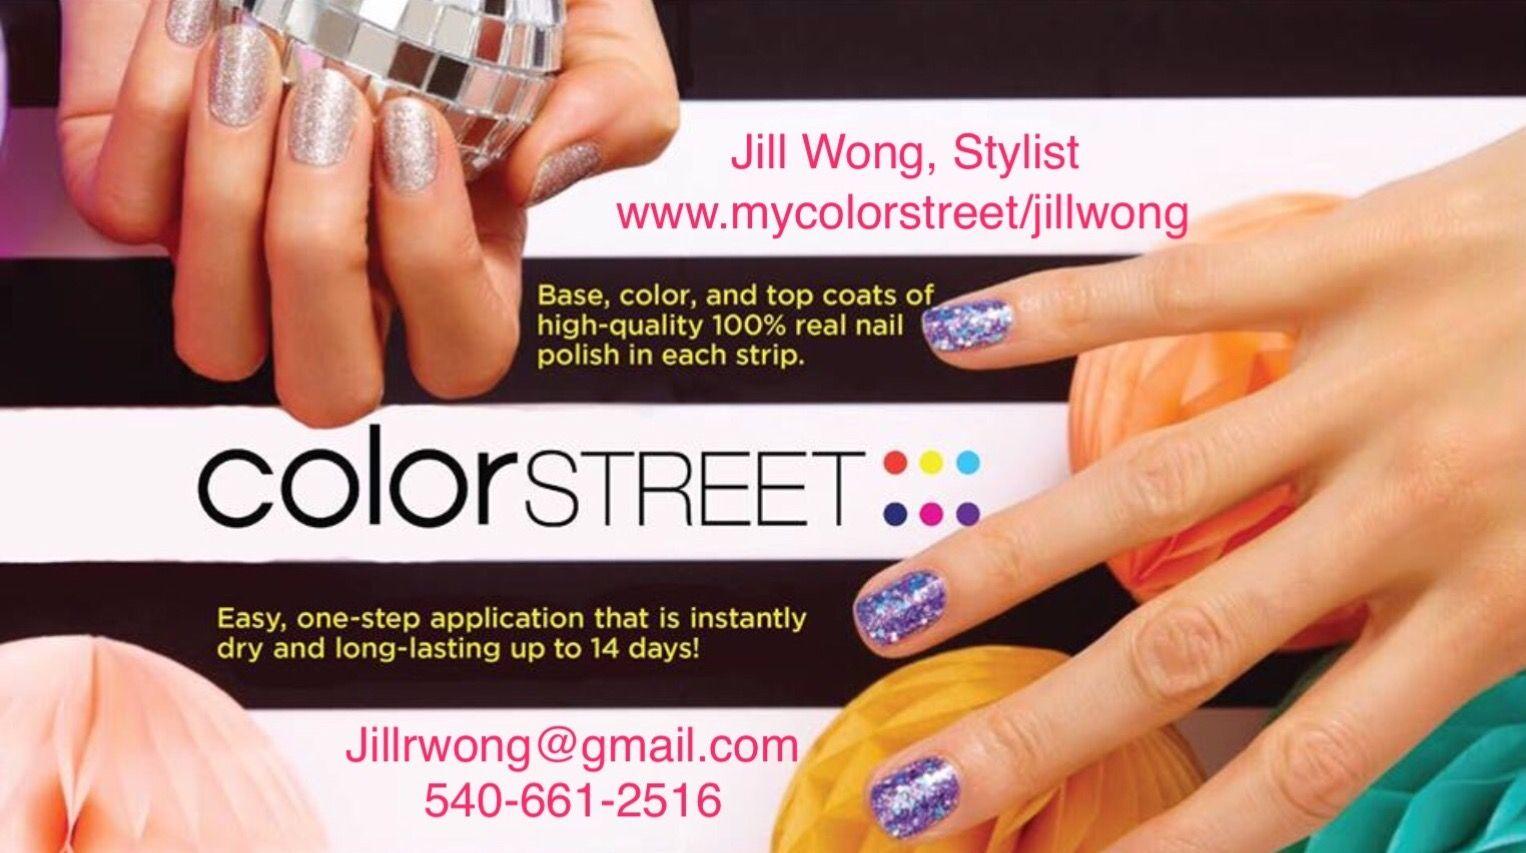 Pin by Jill Wong on Dream Believer nails | Pinterest